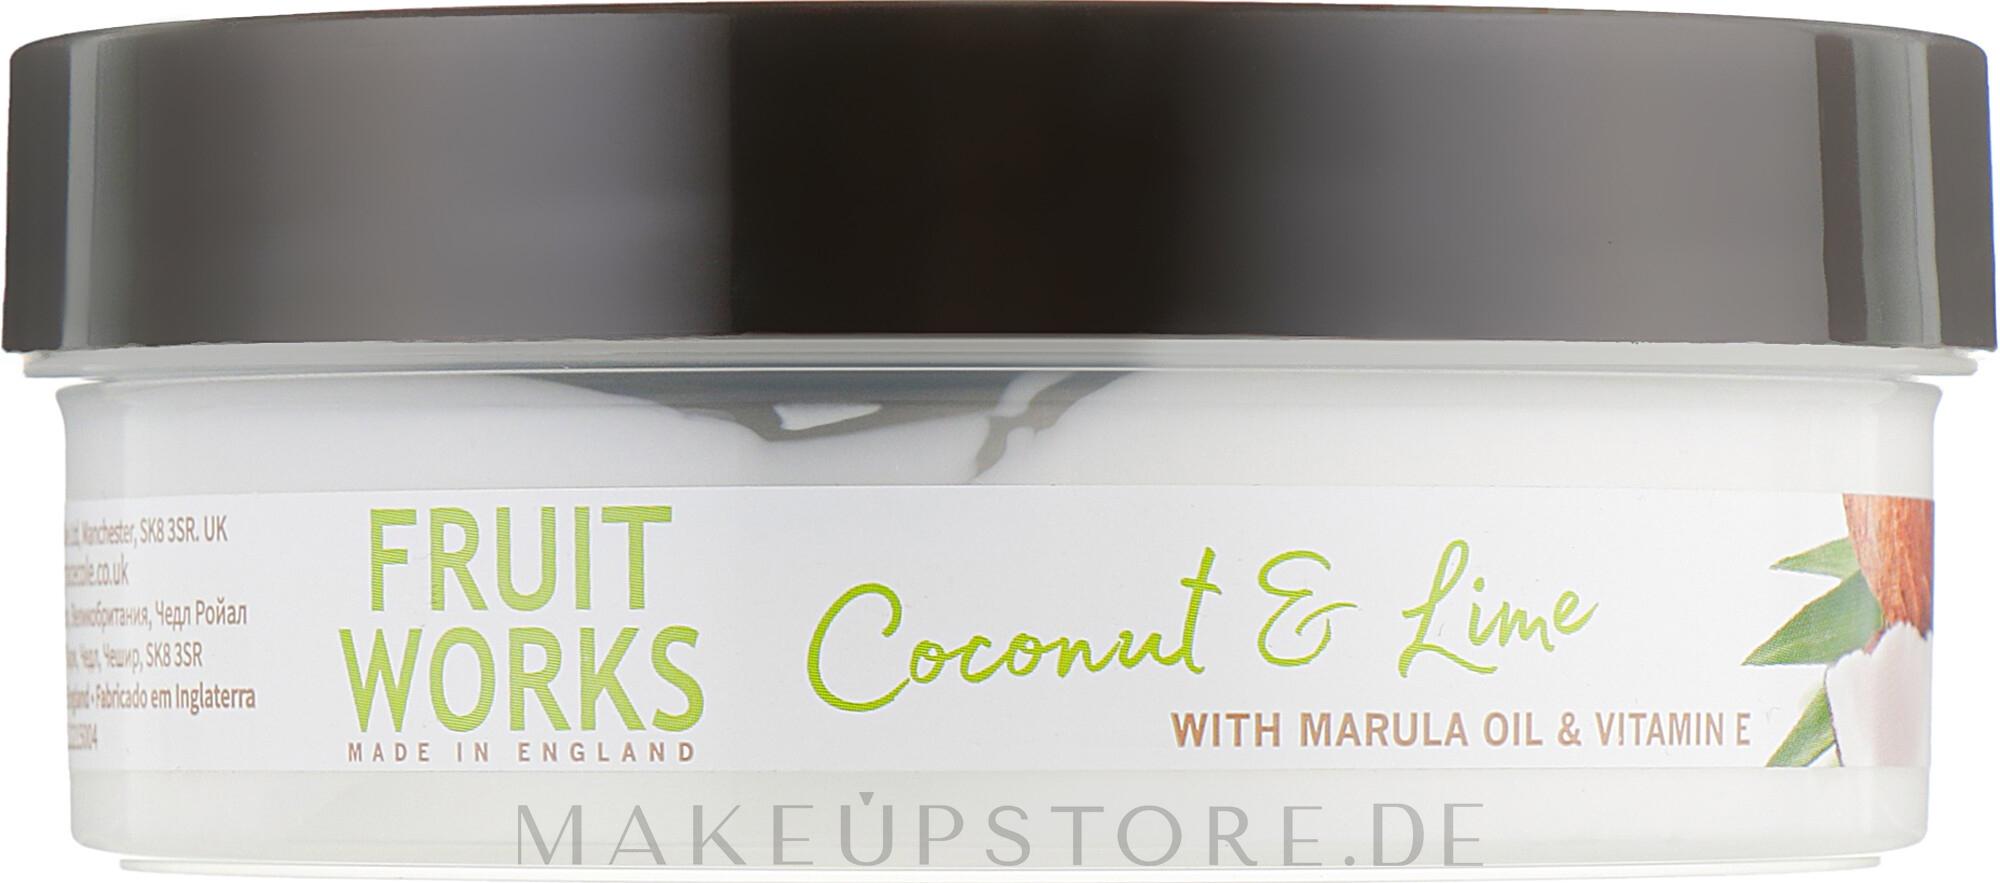 Körperbutter mit Kokosnuss und Limette - Grace Cole Fruit Works Body Butter Coconut & Lime — Bild 225 g